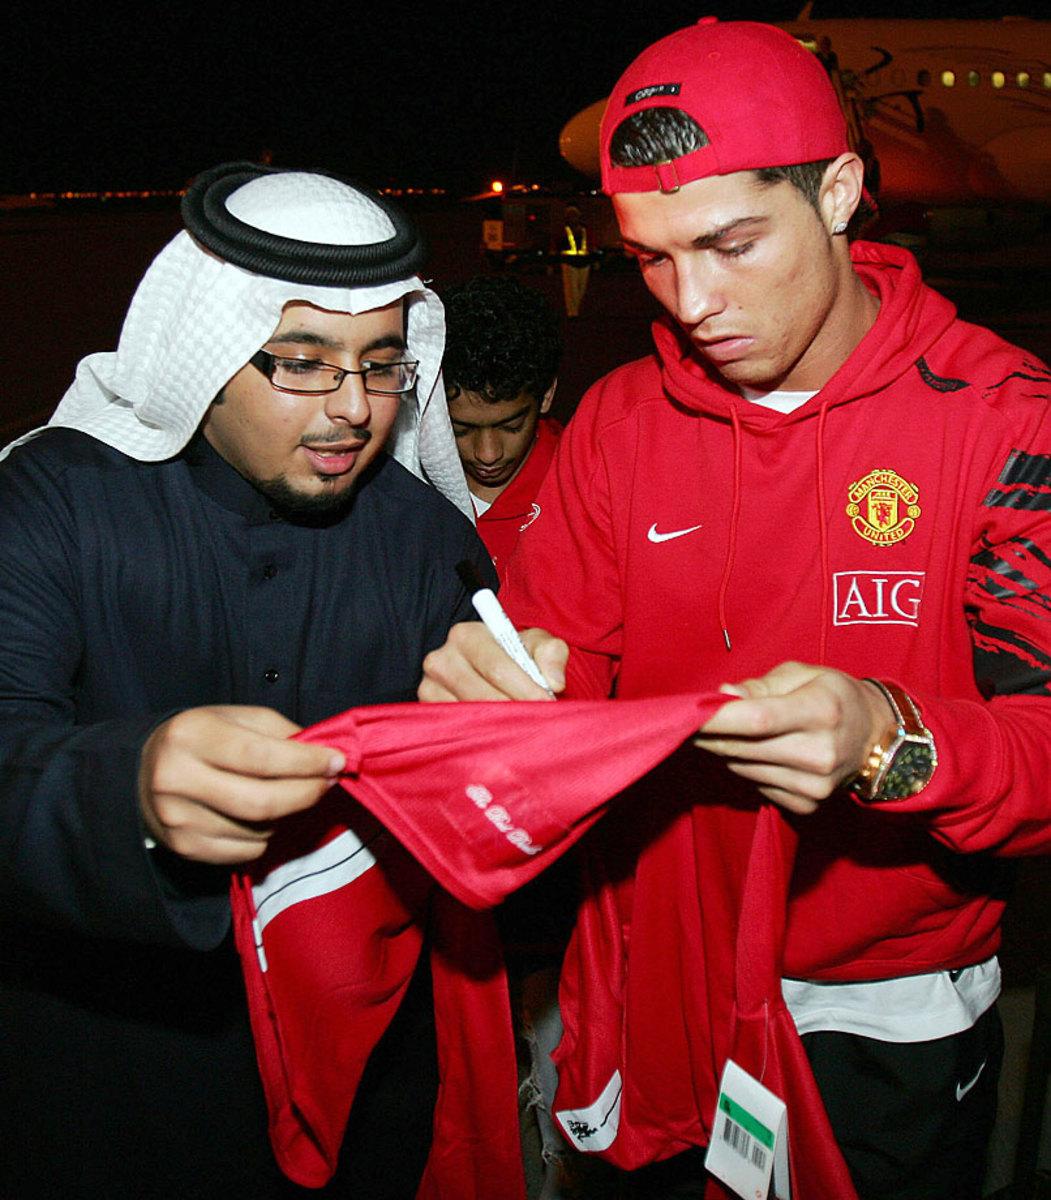 2008-Cristiano-Ronaldo-Saudi-fan.jpg